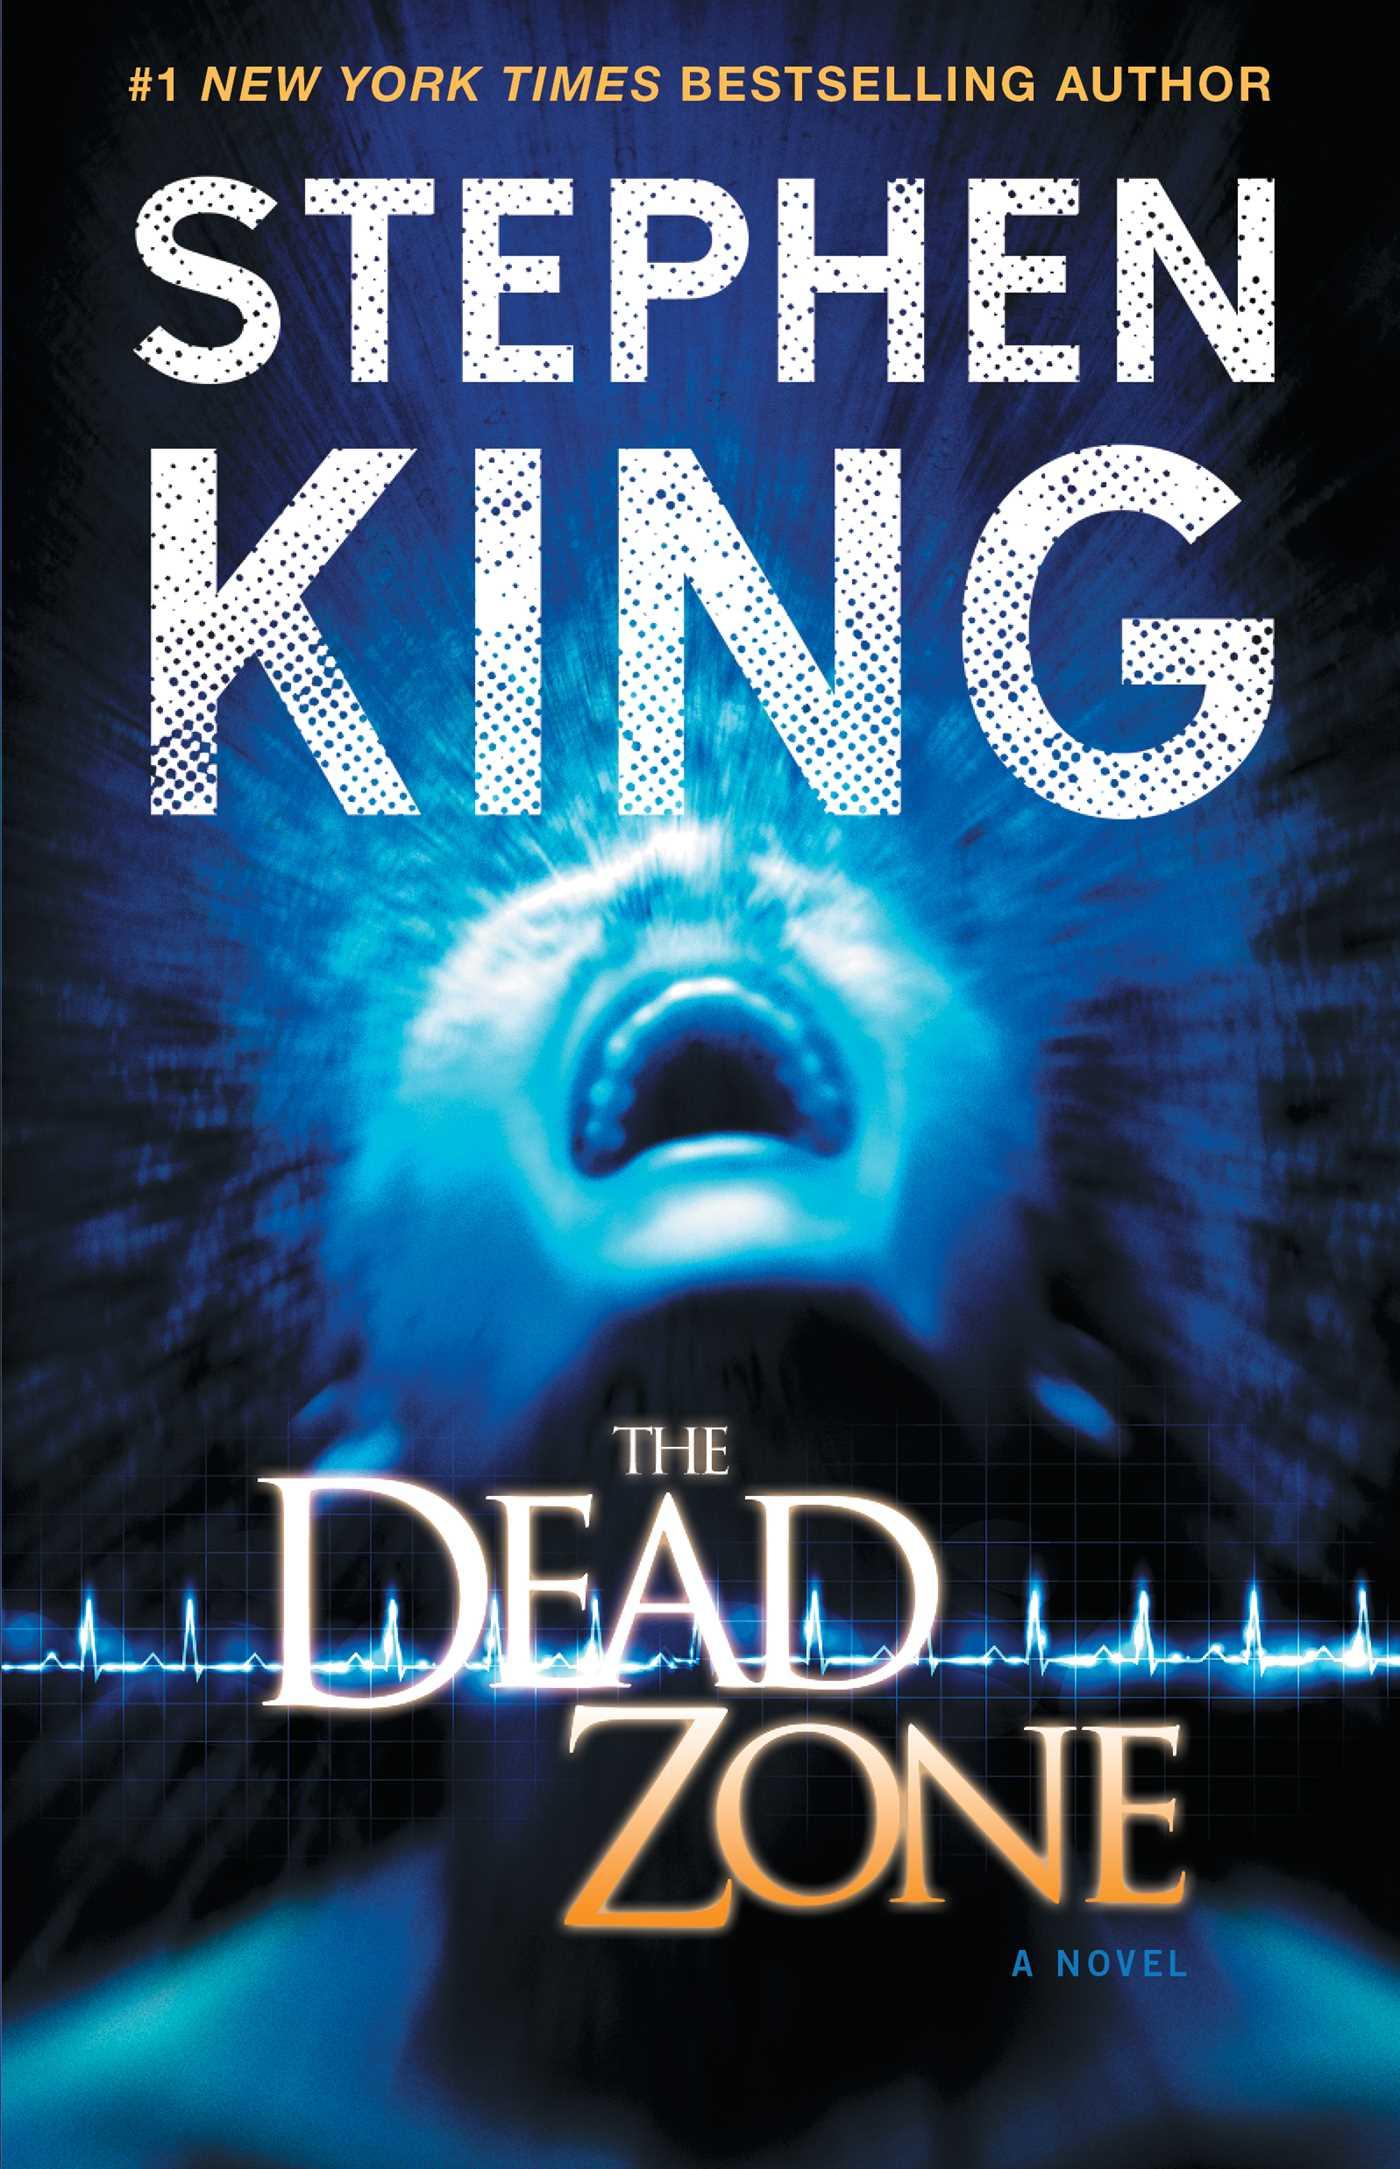 The dead zone 9781501141157 hr